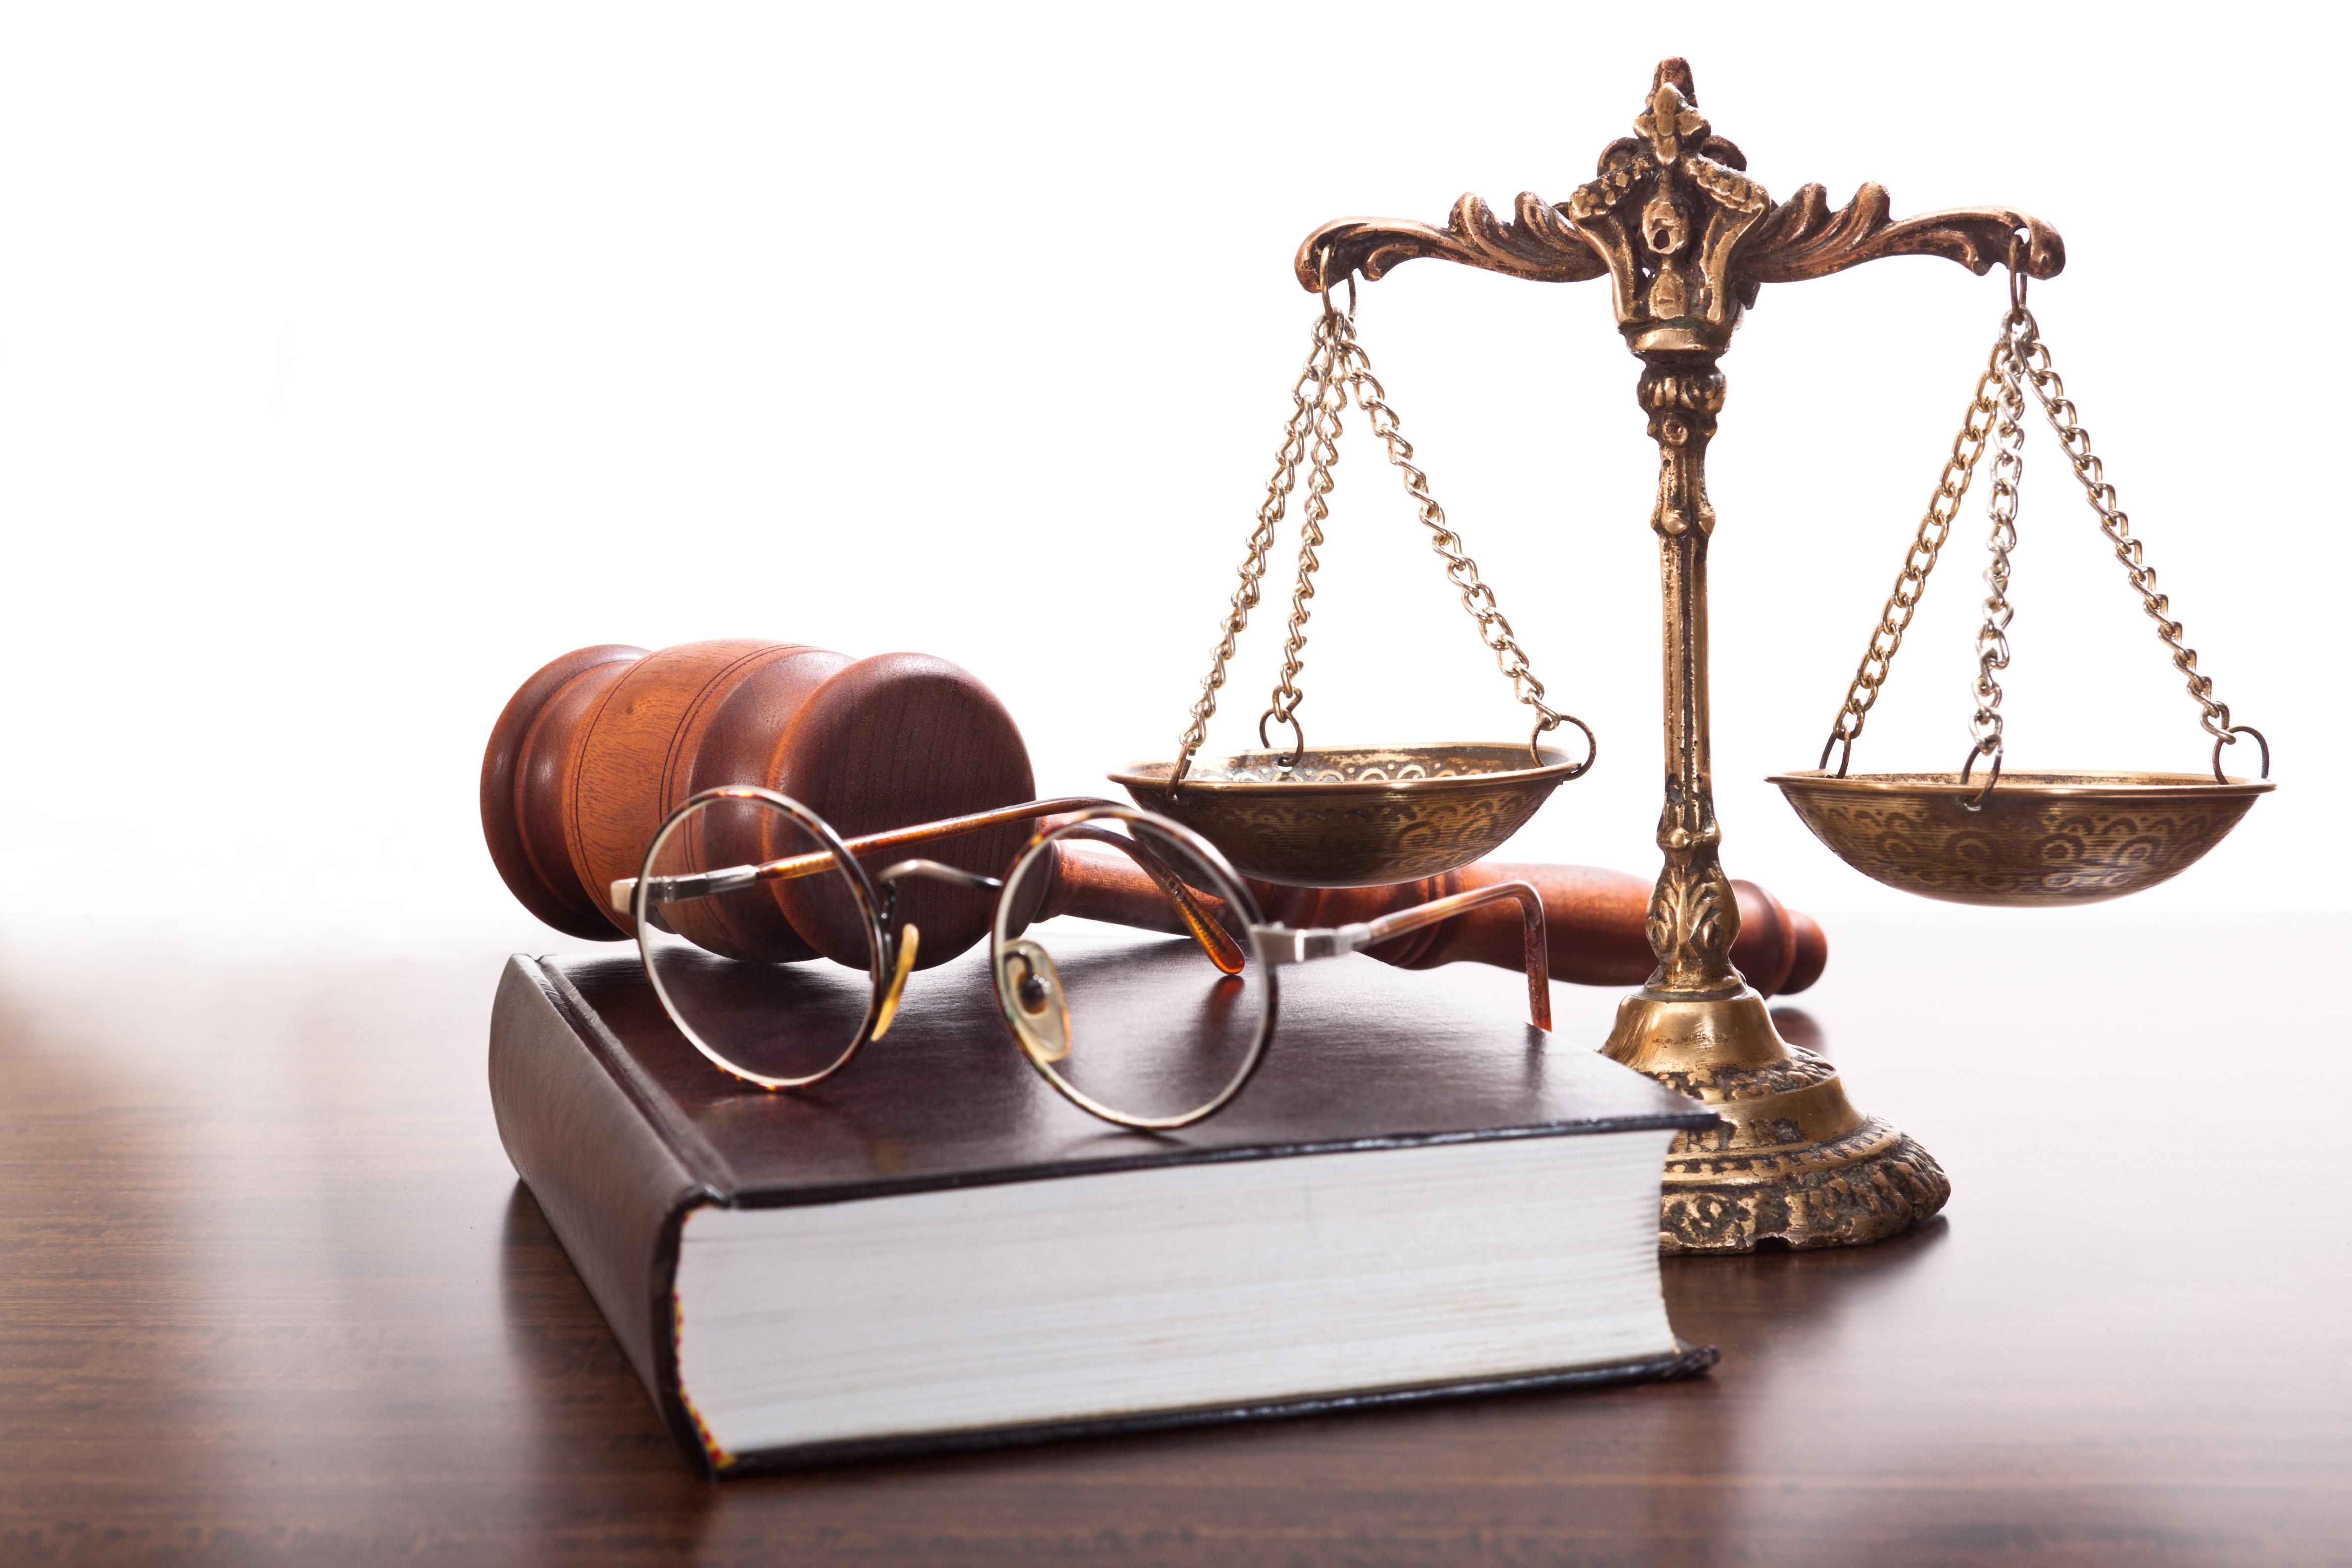 Avukat BAHAR UÇAR